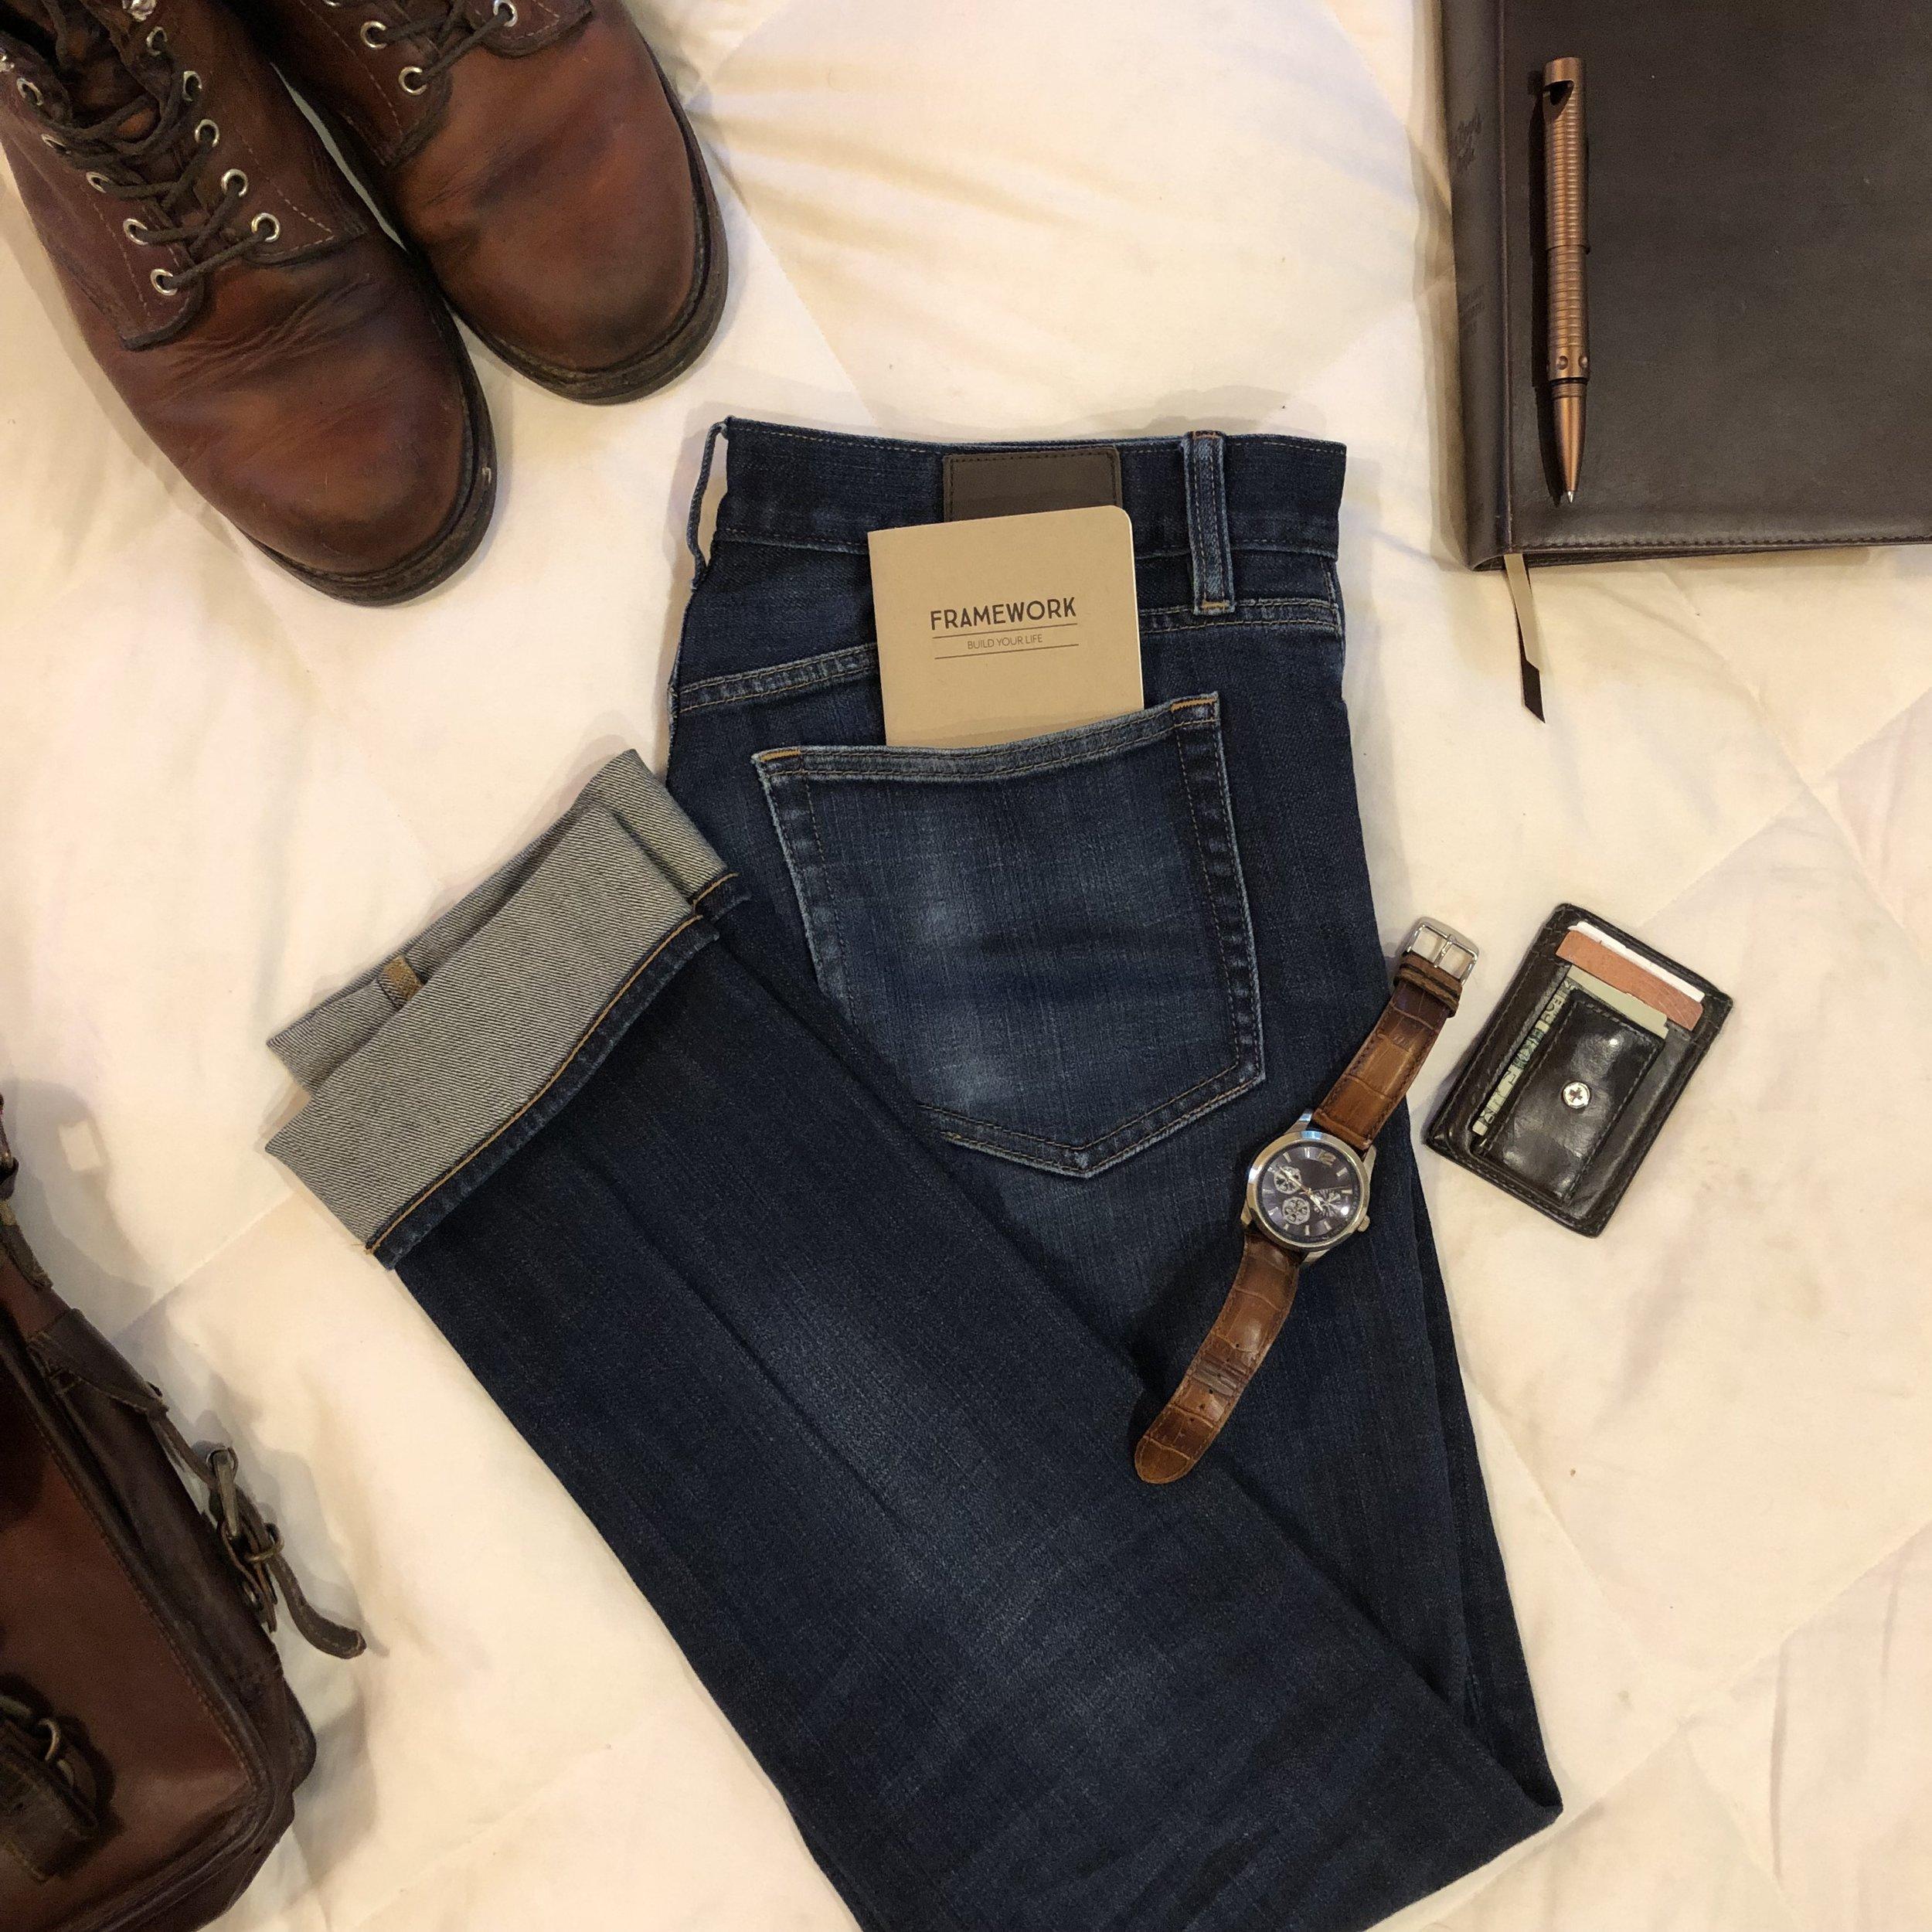 Framework Back-Pocket Bible Study Journal for Men He Reads Truth